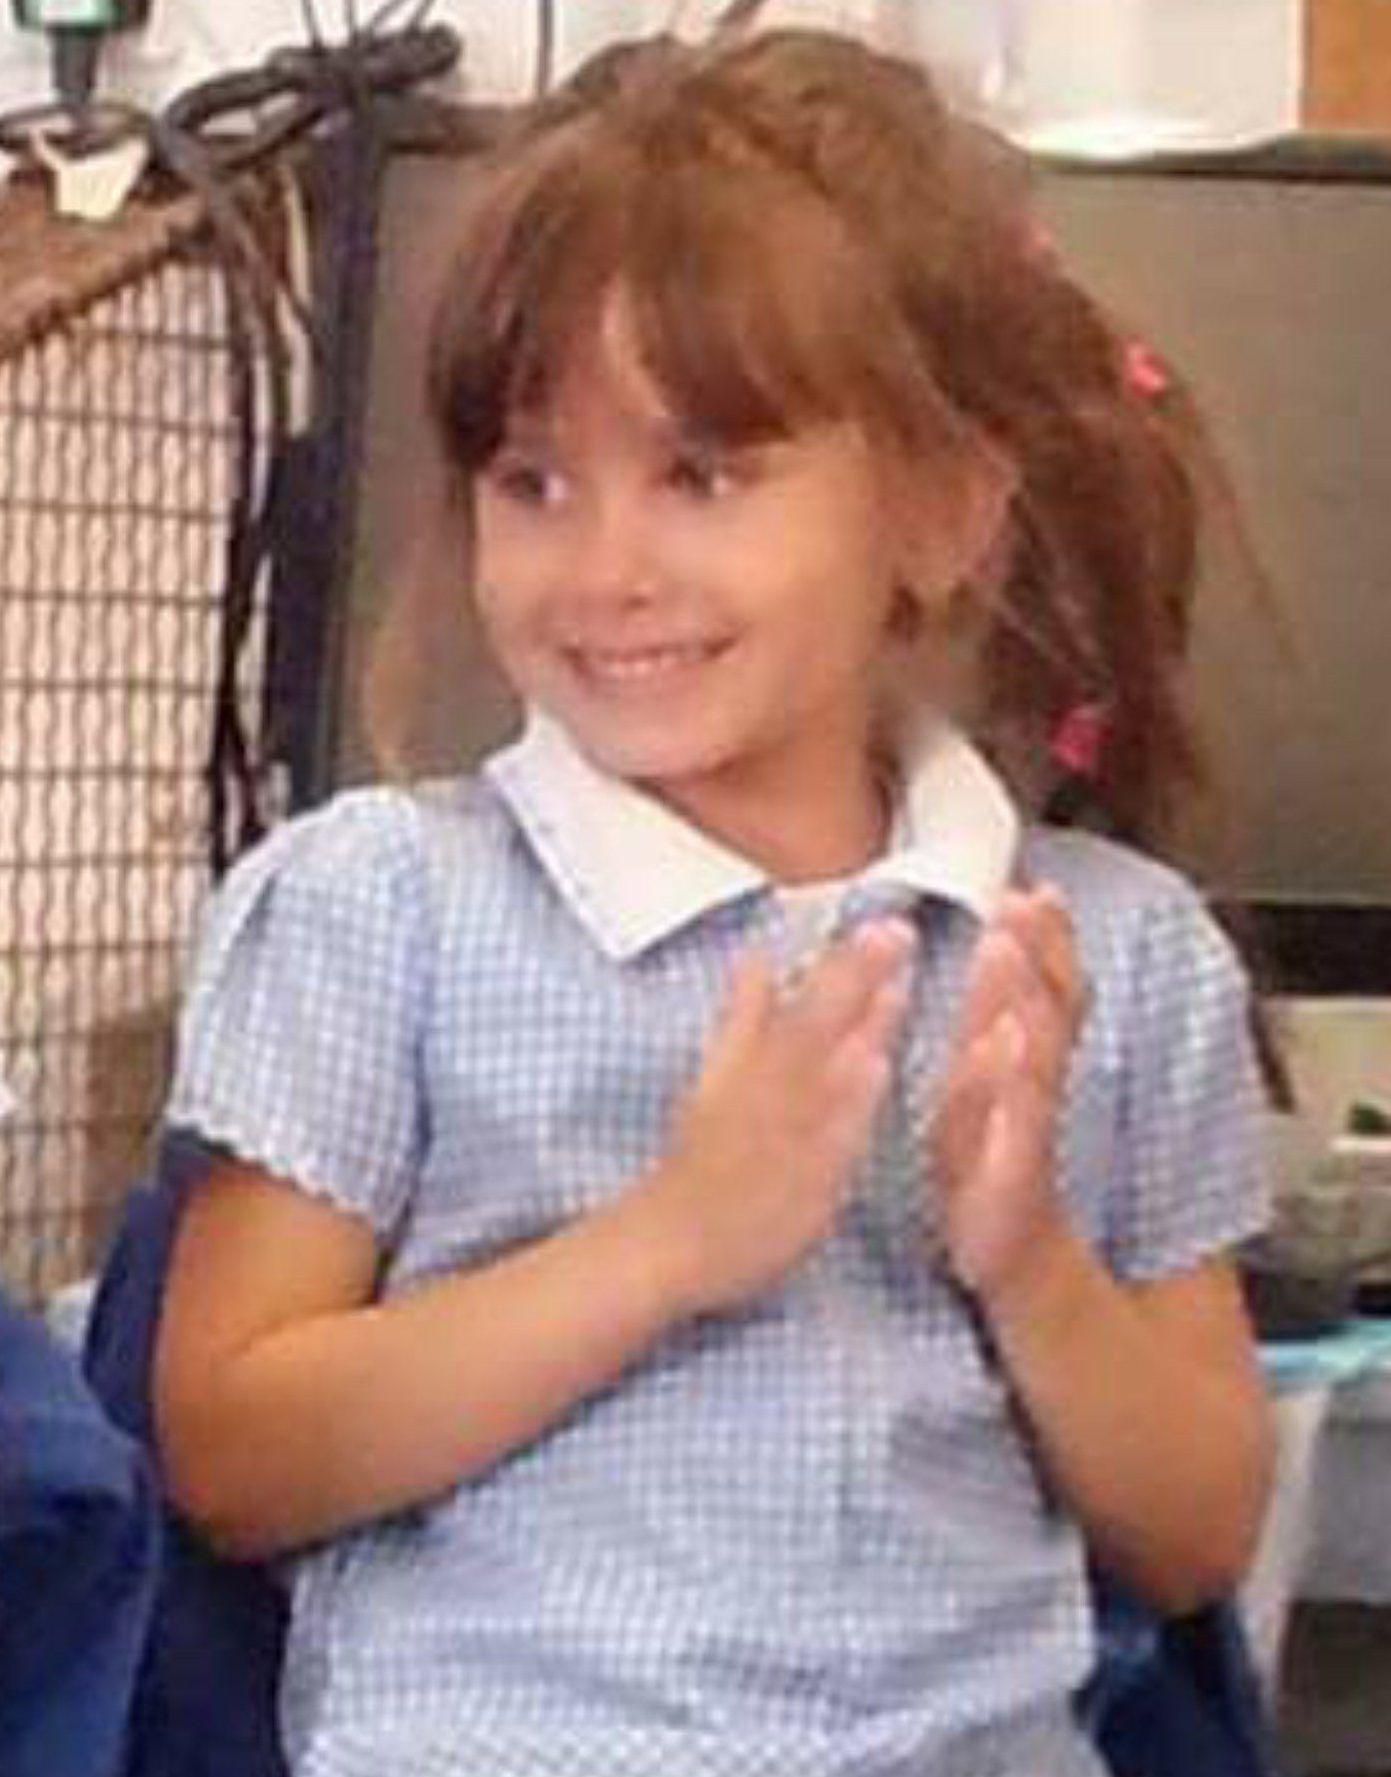 Adolescenta de 15 ani acuzata ca a ucis o fetita de 7 ani, pe un teren de joaca. Acum 2 saptamani si-a condus mama la altar